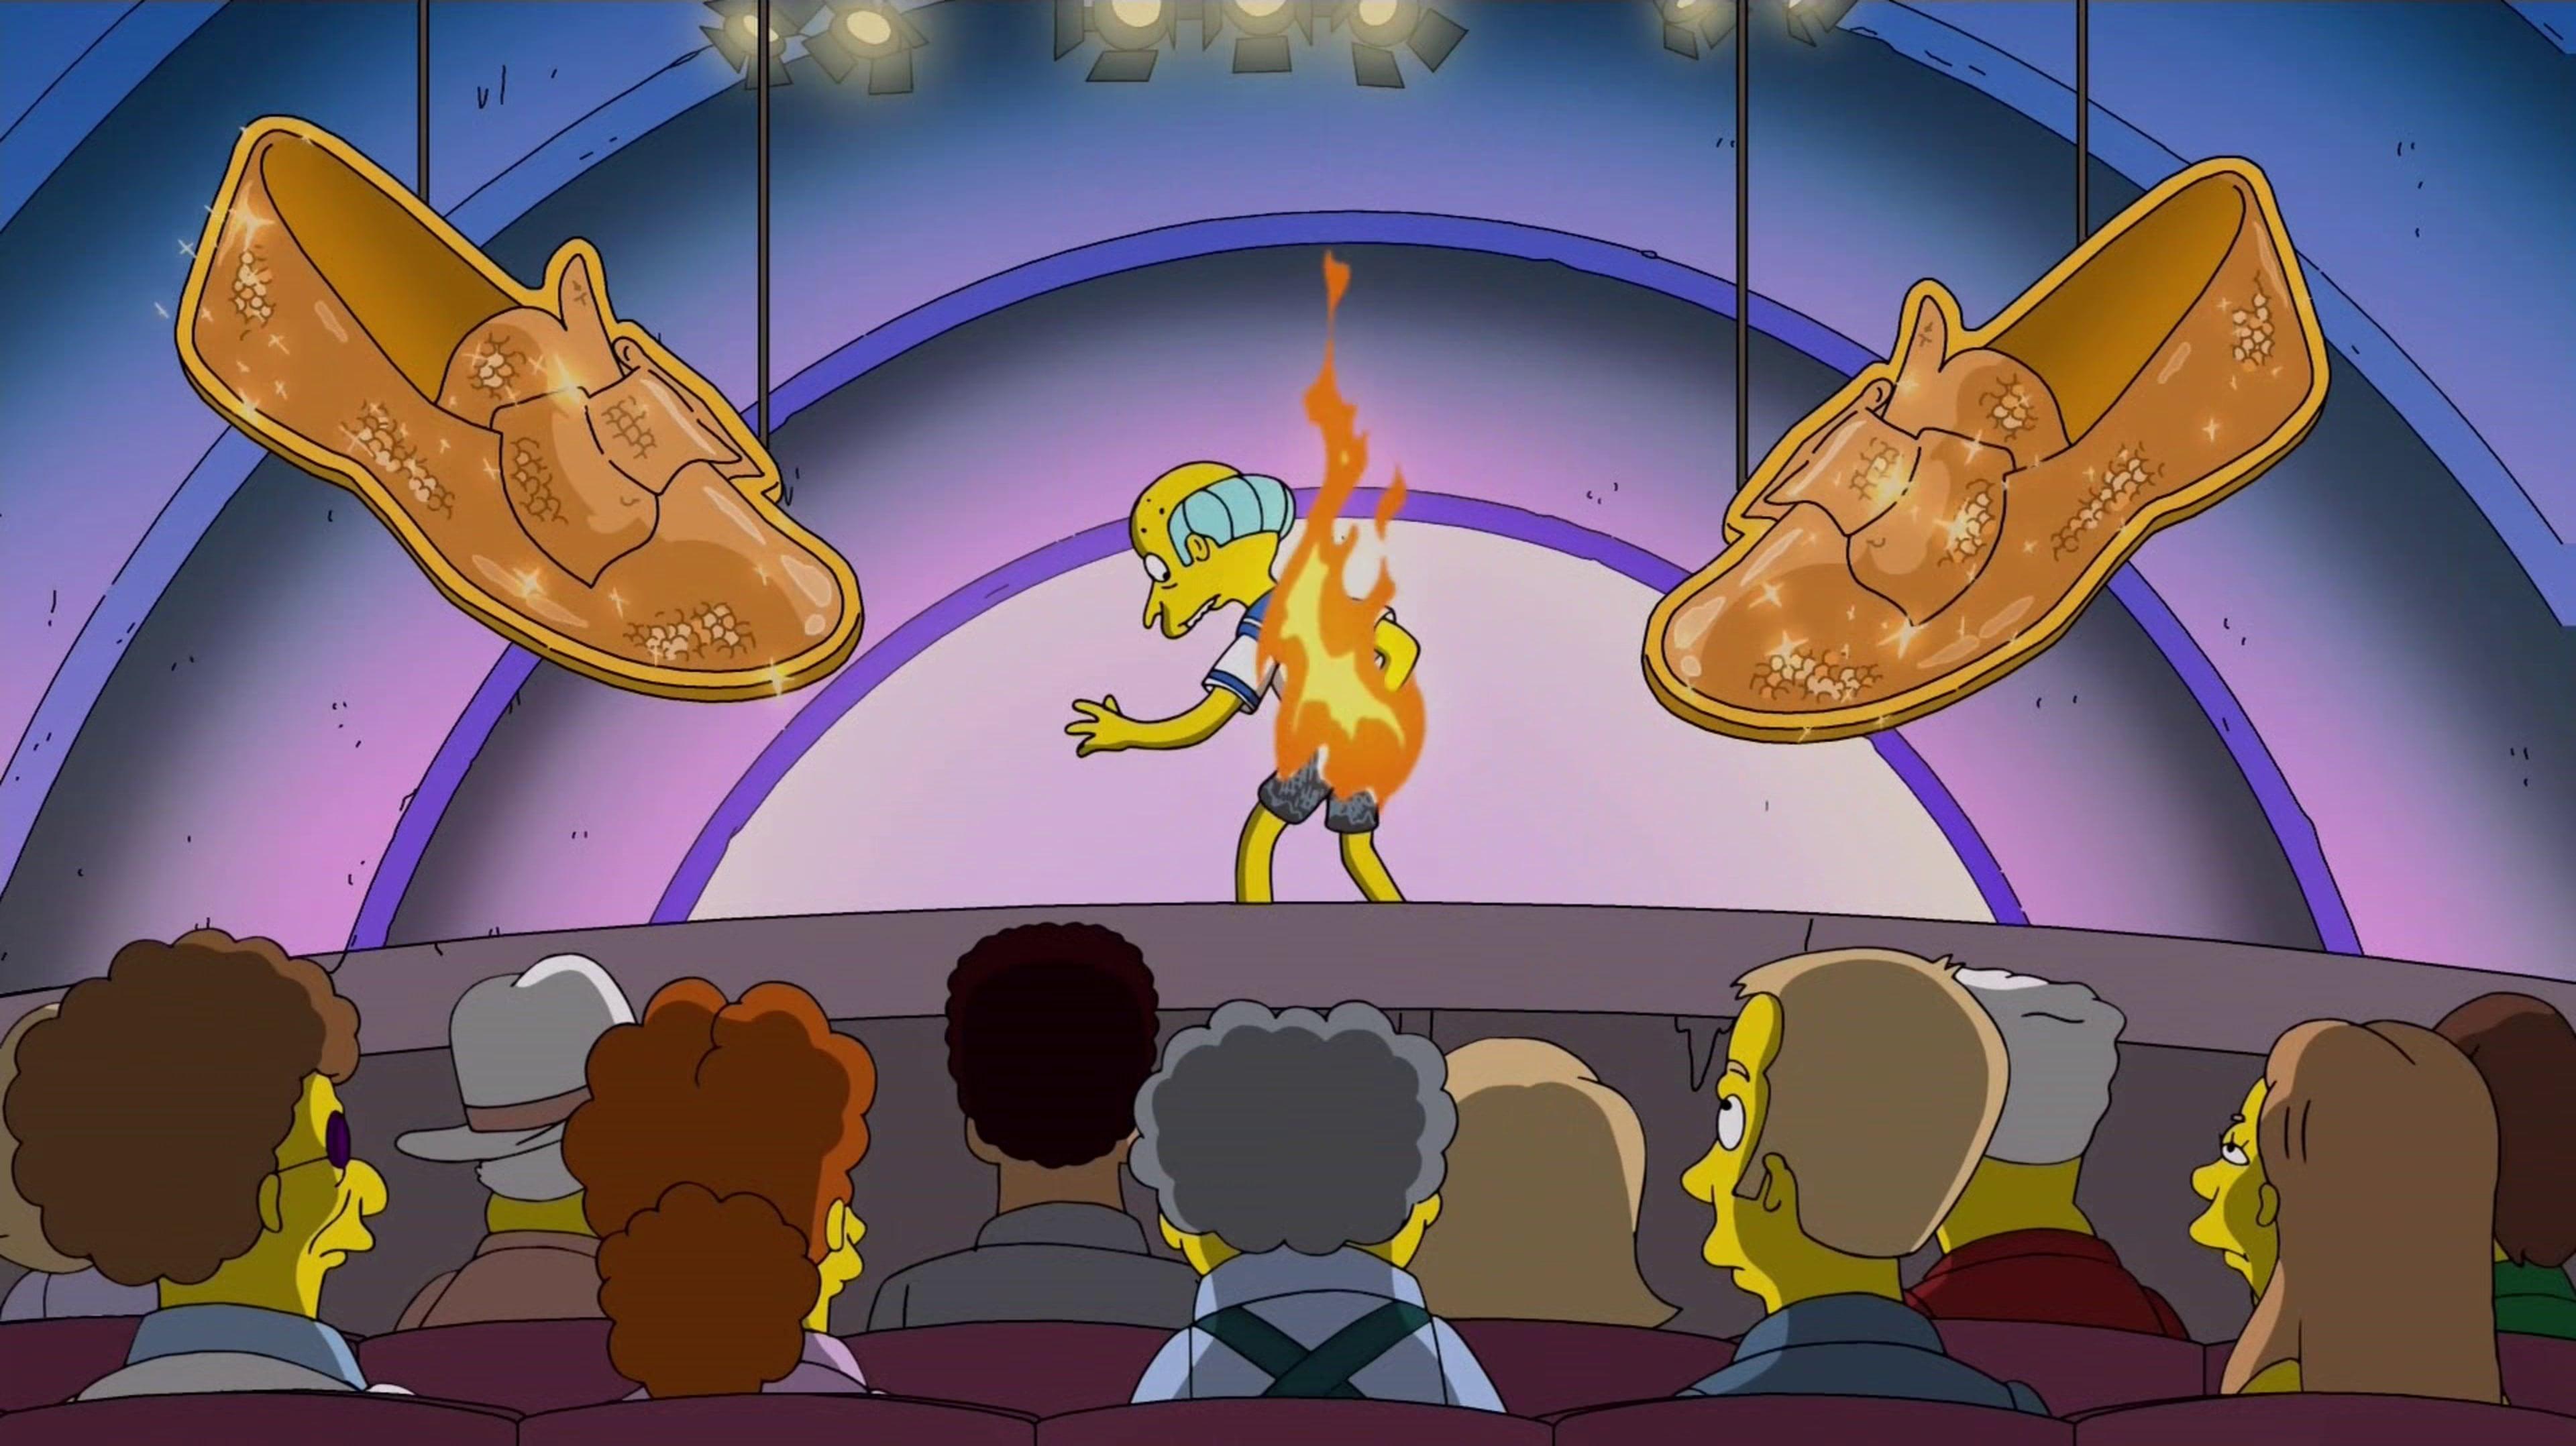 The Simpsons Season 28 : Monty Burns' Fleeing Circus